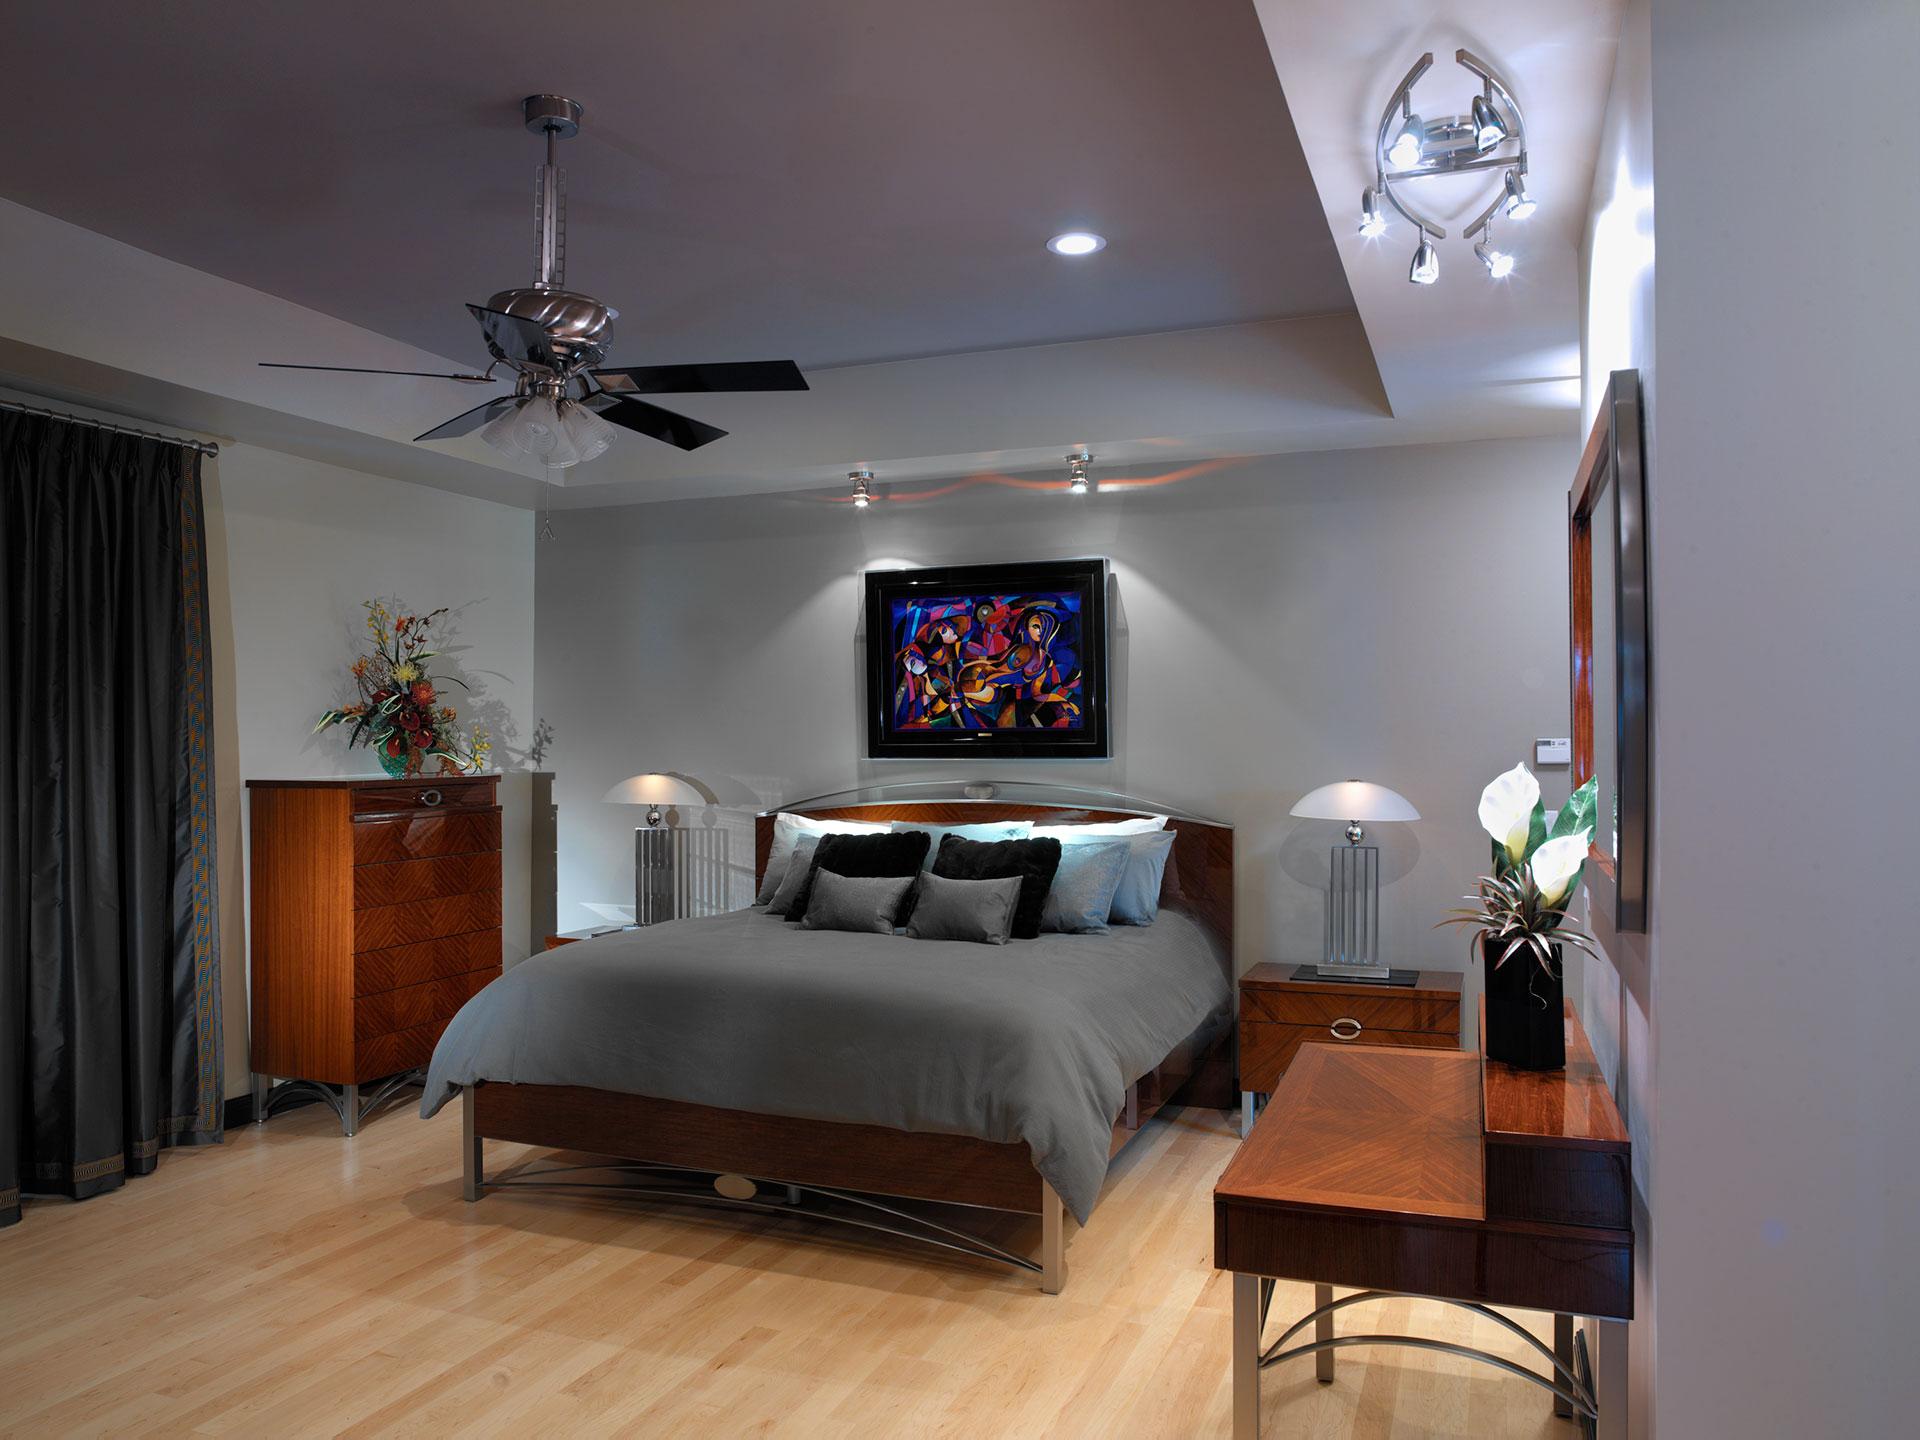 master bedroom, masculine master bedroom, contemporary bedroom decor, masculine bedroom decor, interior designer cornwall, interior designer ottawa, Interior Decorating Services - Sheridan Interiors, sheridan interiors kitchens and baths